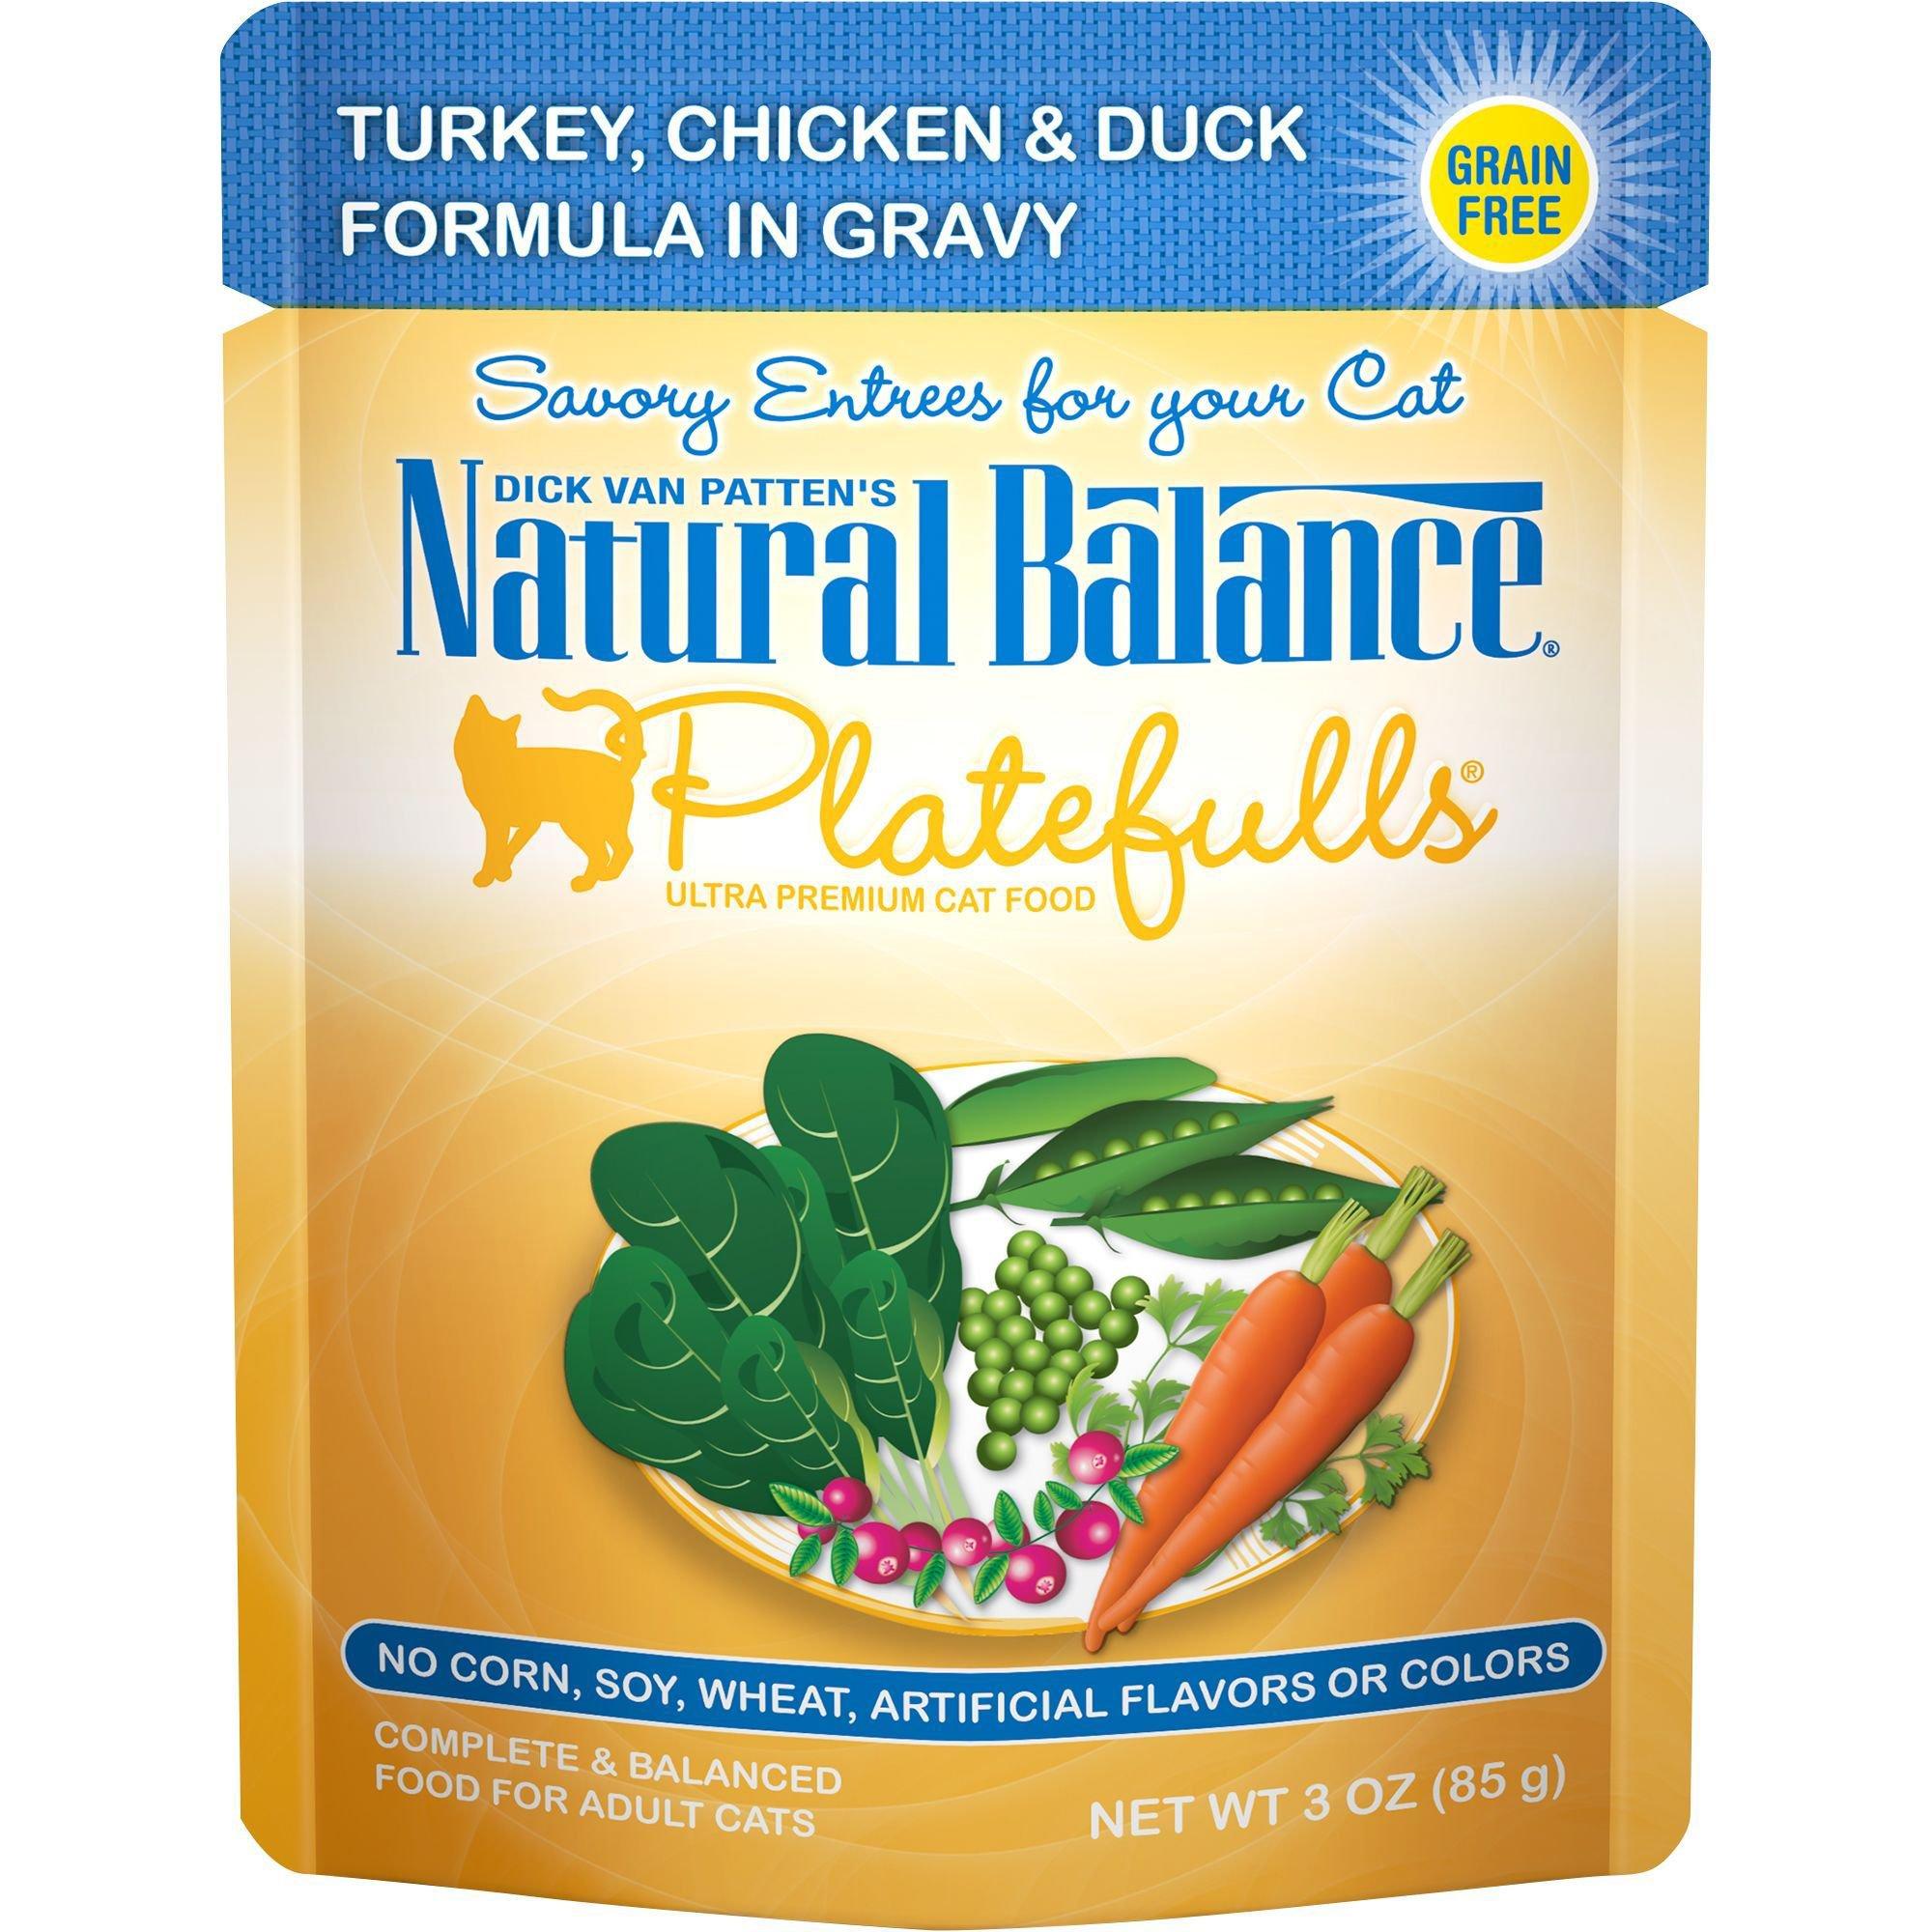 Natural Balance Platefulls Turkey, Chicken & Duck Adult Cat Food